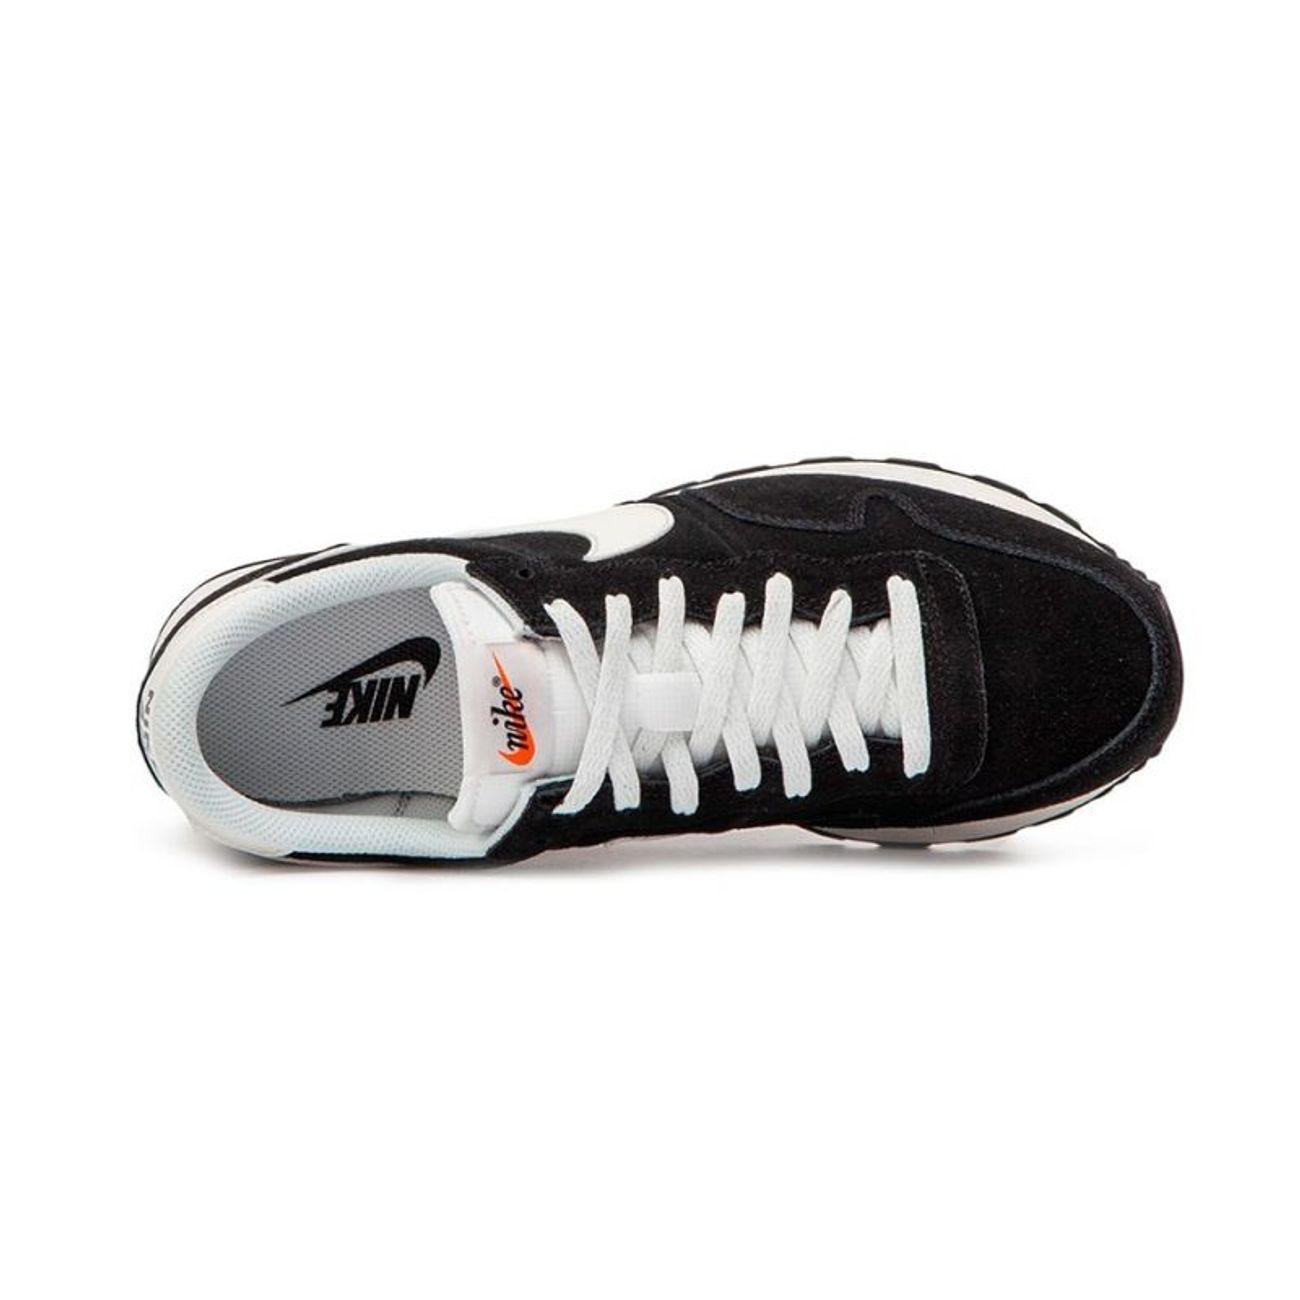 Adulte Nike 001 Ltr Blanc 83 Pegasus Air Padel Noir Ni827922 Qthsrd